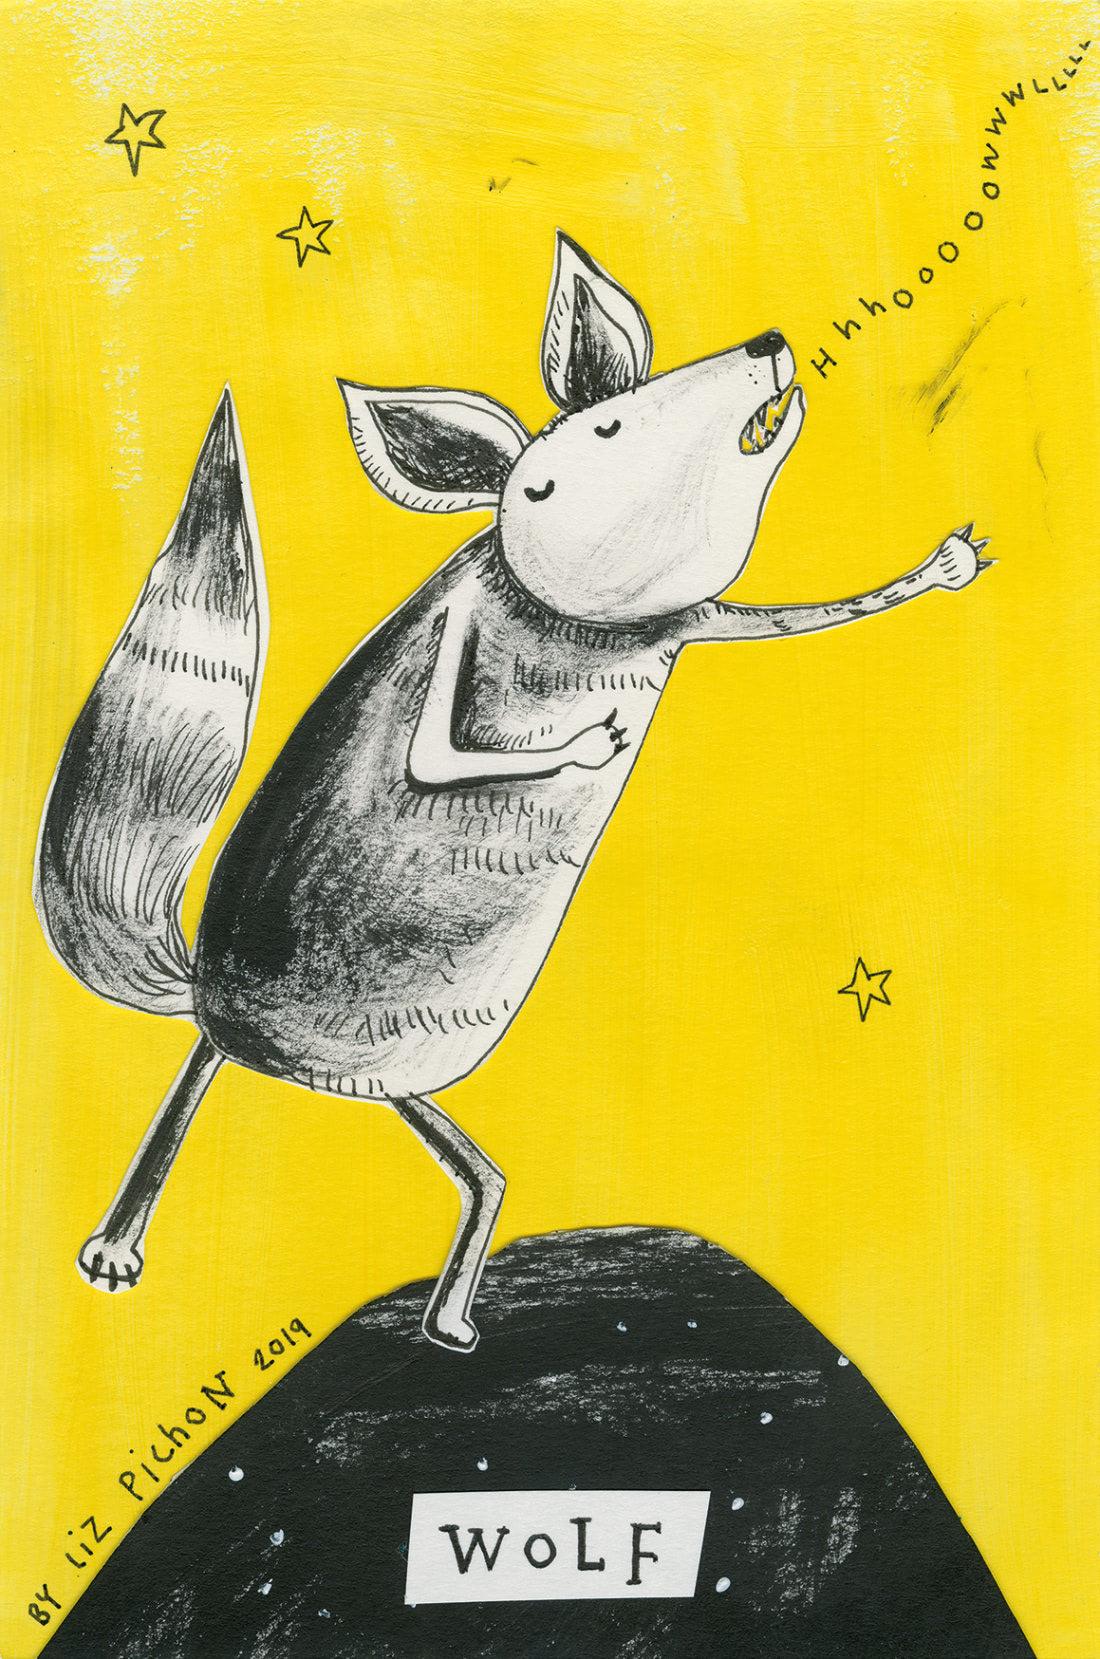 Wolf (Liz Pichon Patronus on a Postcard)